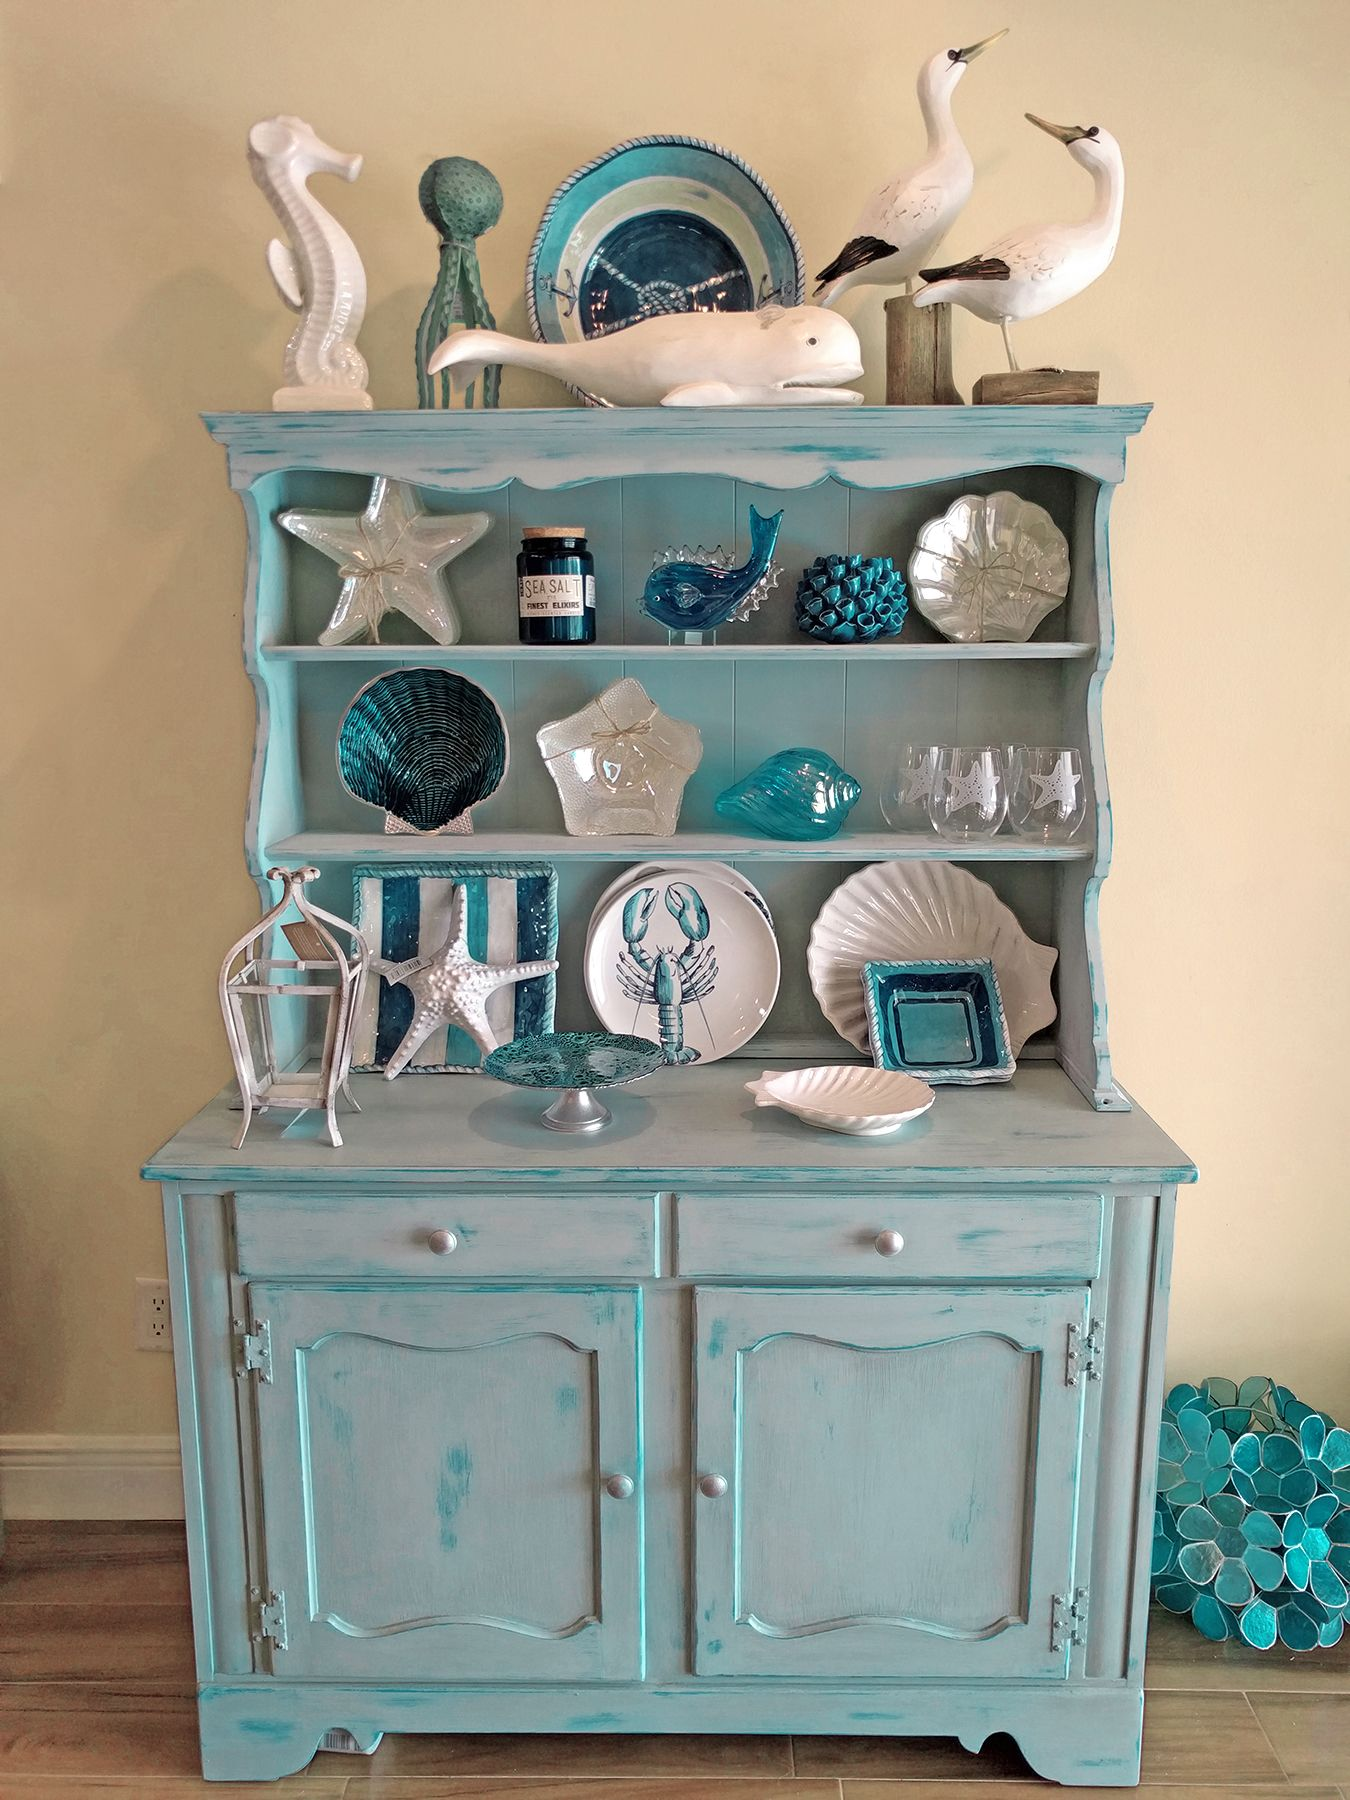 restoring furniture ideas. Beachy Coastal Hutch, Americana Decor Chalk Paint Restoring Furniture Ideas R